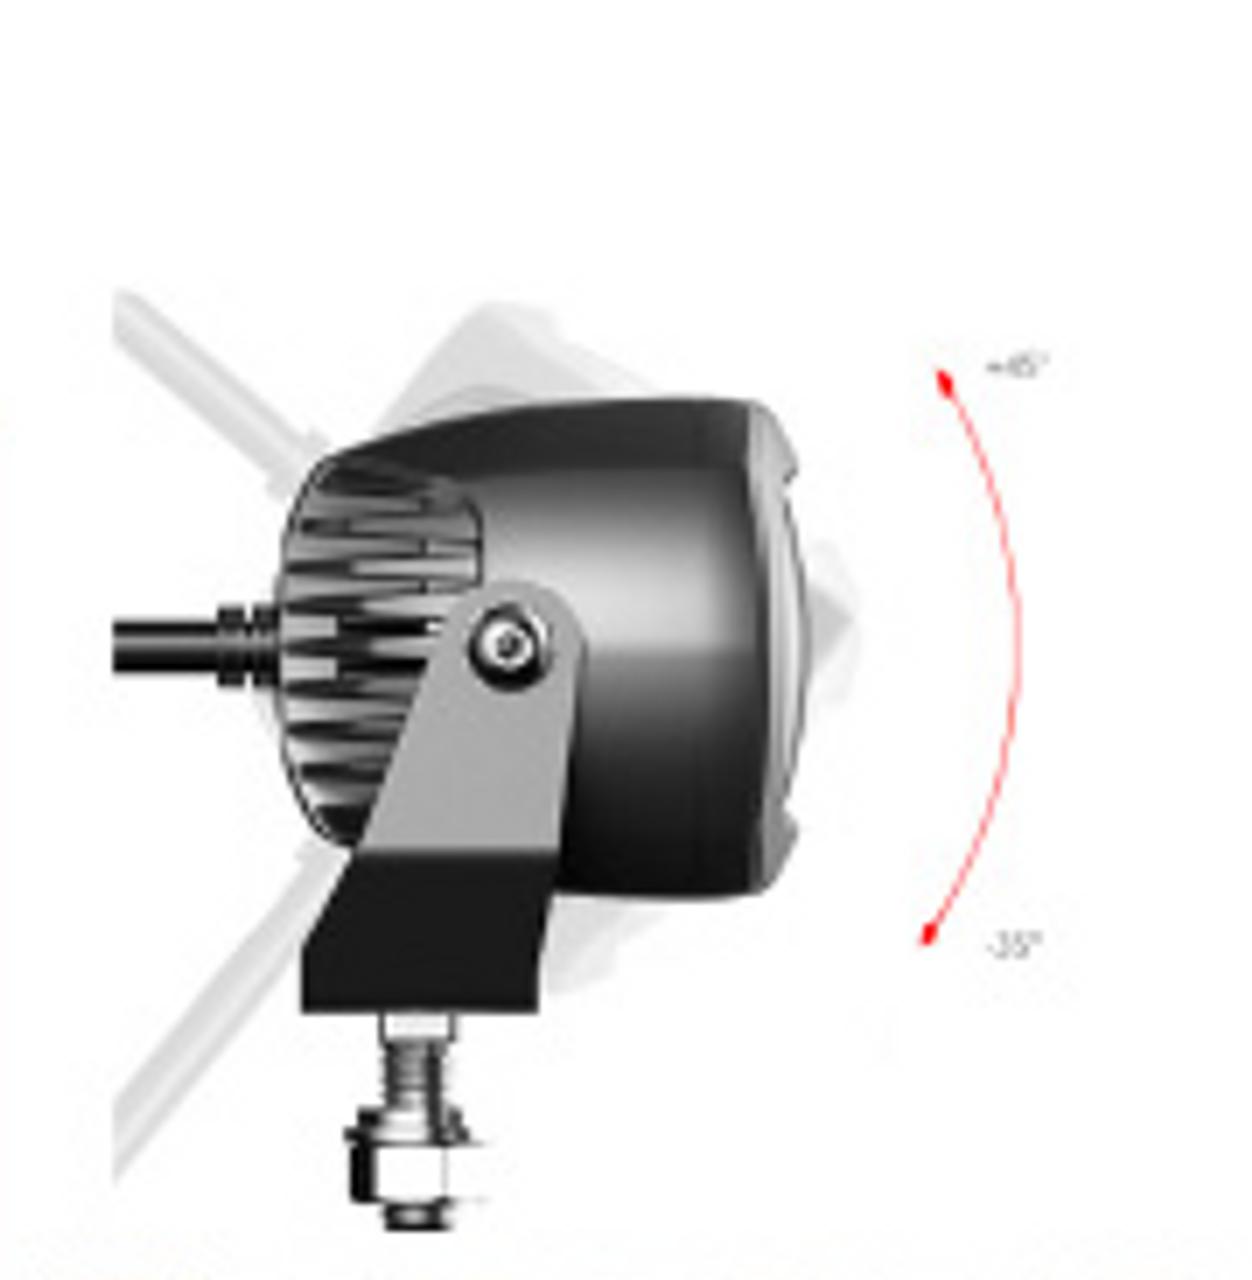 Adjustable mounting bracket system.